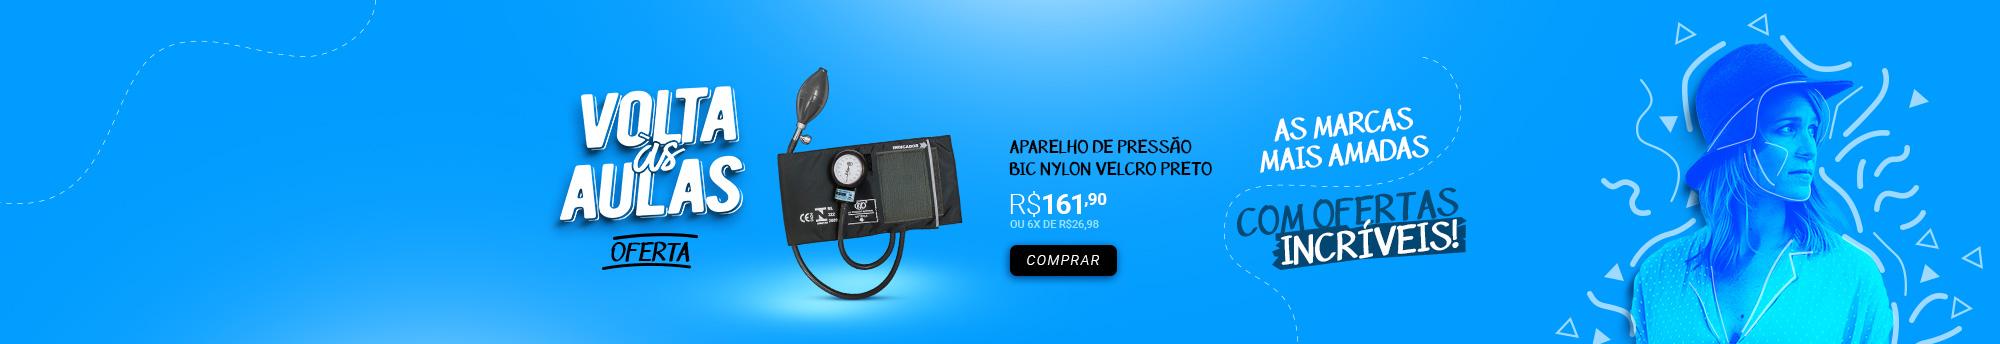 Banner VA 17-2 Home Produtos ApPressao BIC